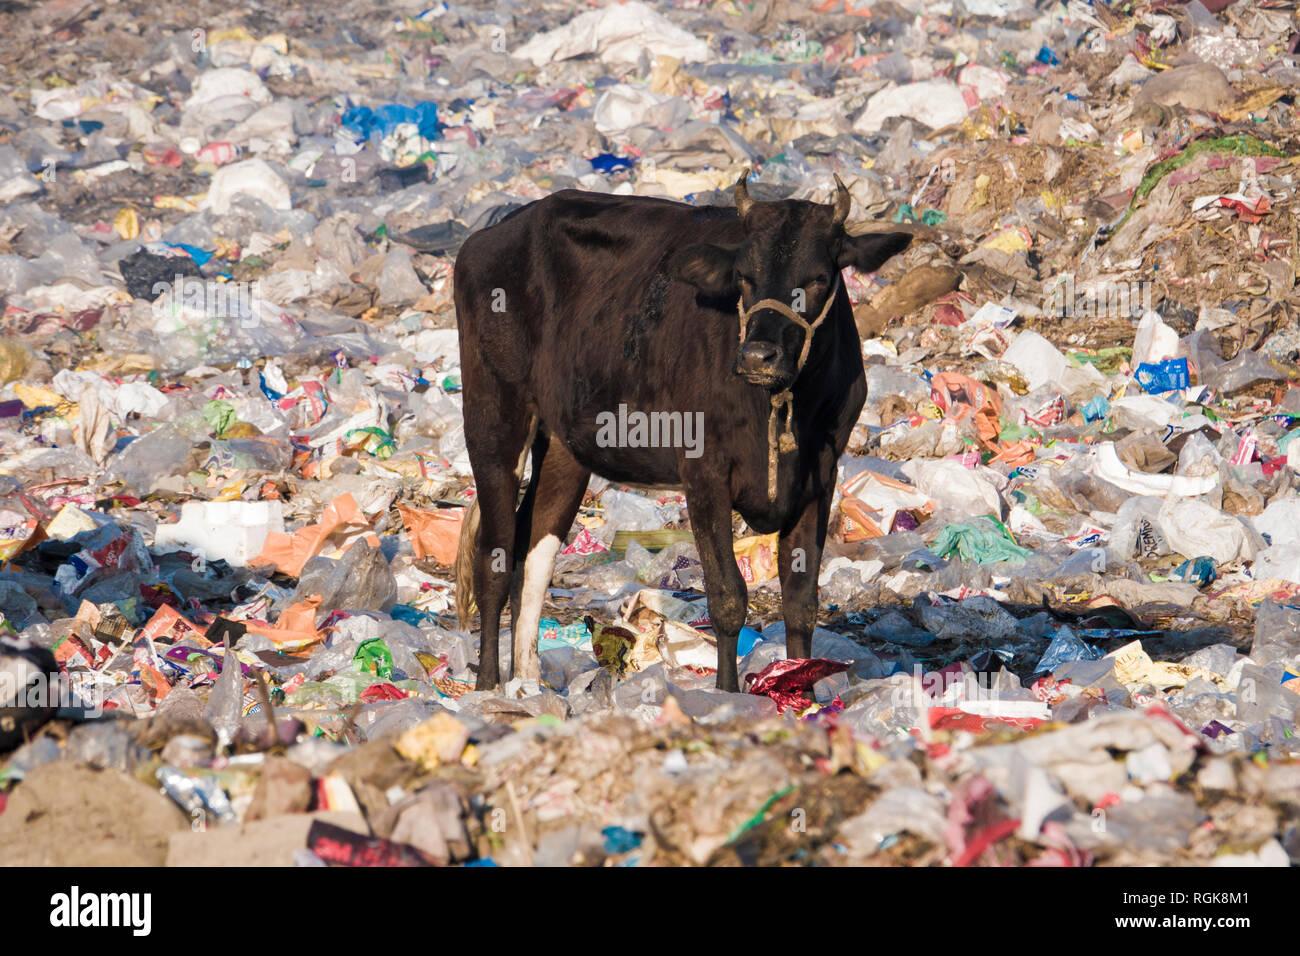 Cow standing among piles of plastic trash in dumping ground at Rishikesh, Uttarakhand, India - Stock Image